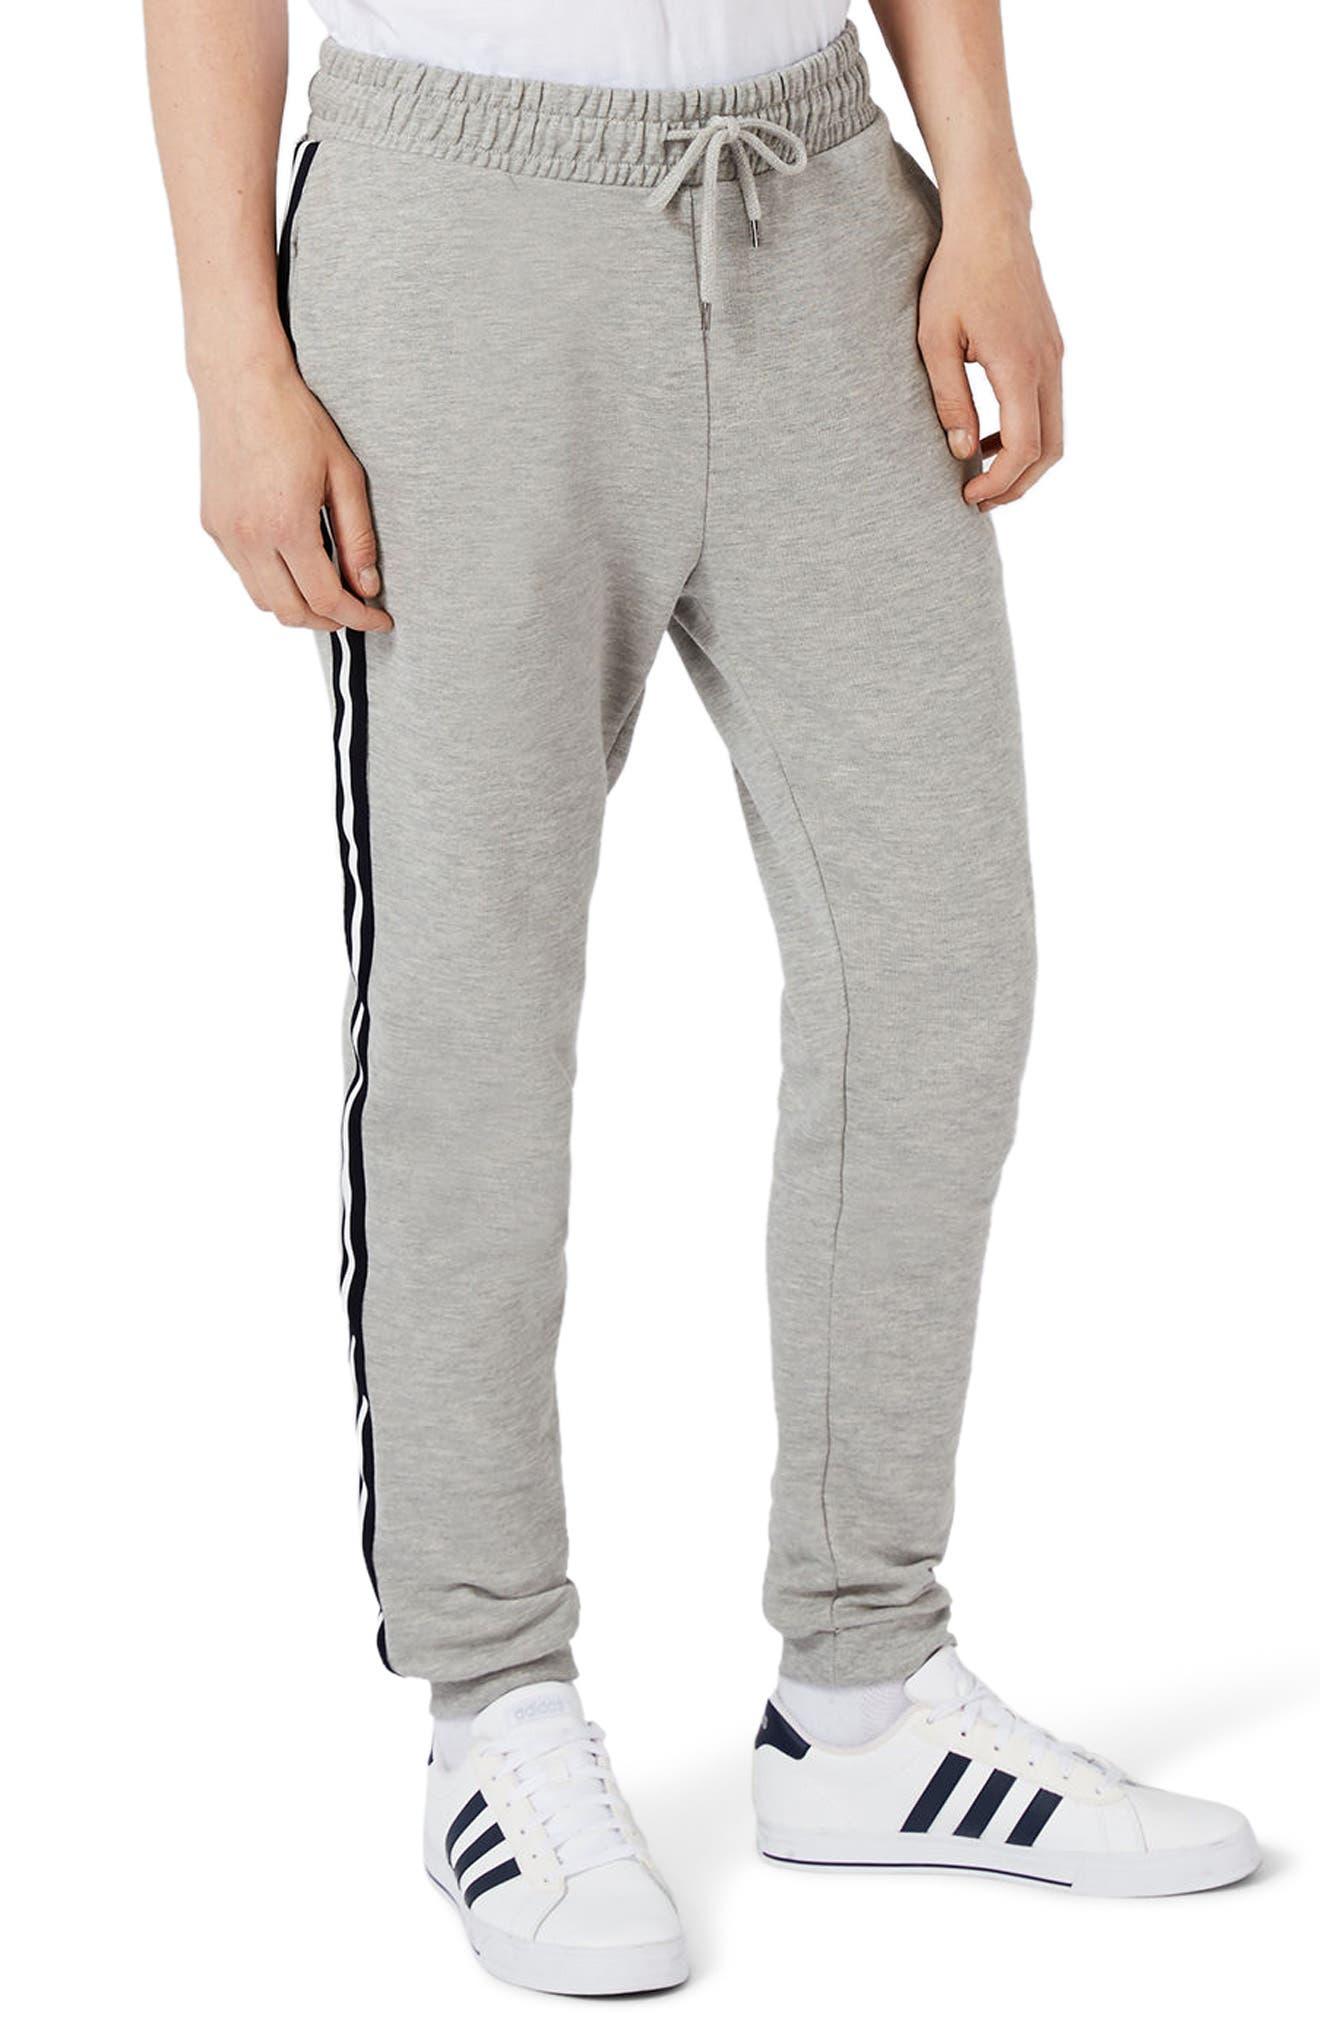 Topman Stripe Taped Sweatpants